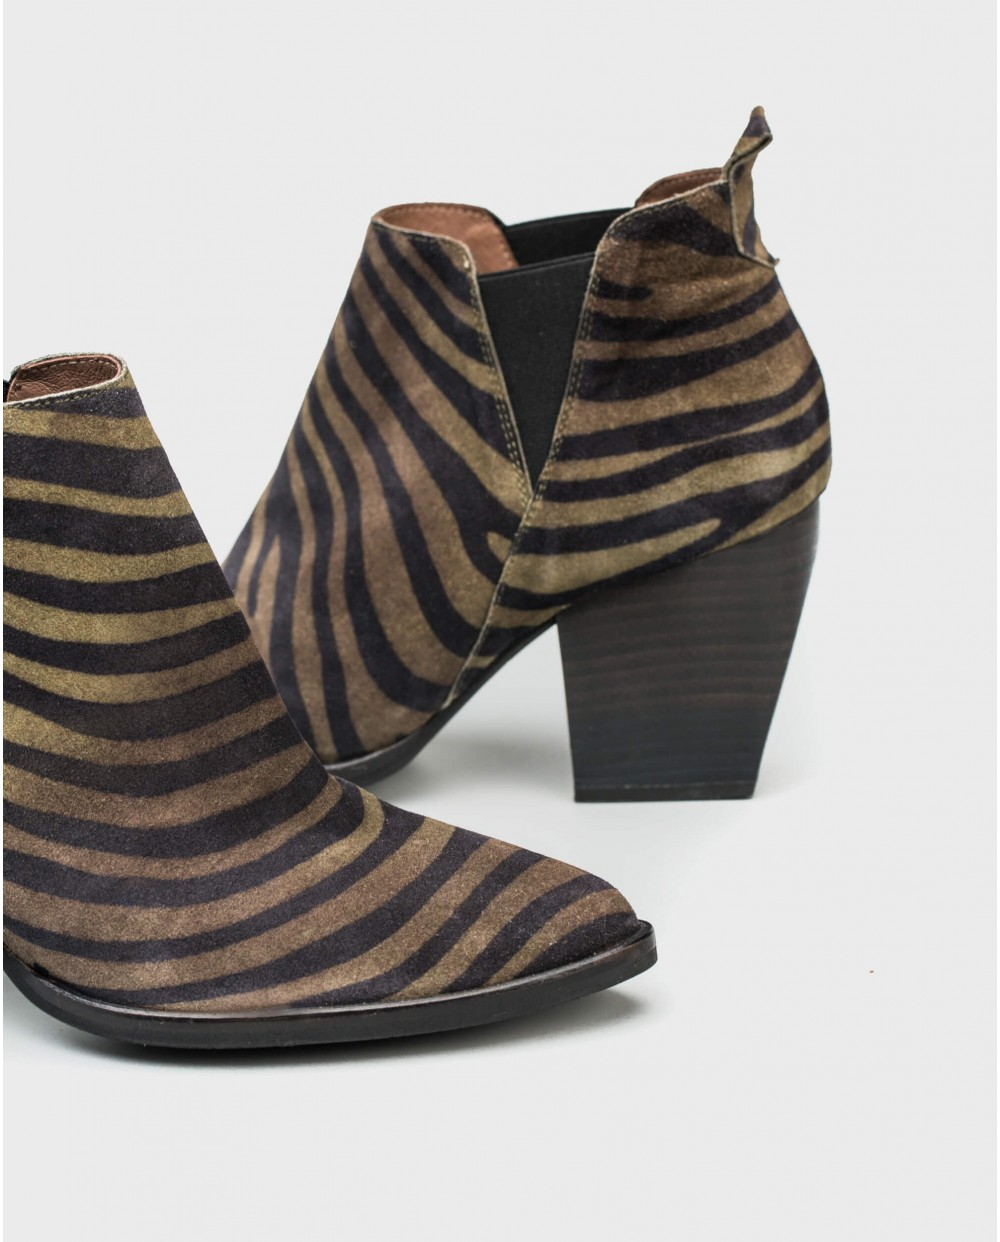 Wonders-Outlet-Zebra print cowboy ankle boot